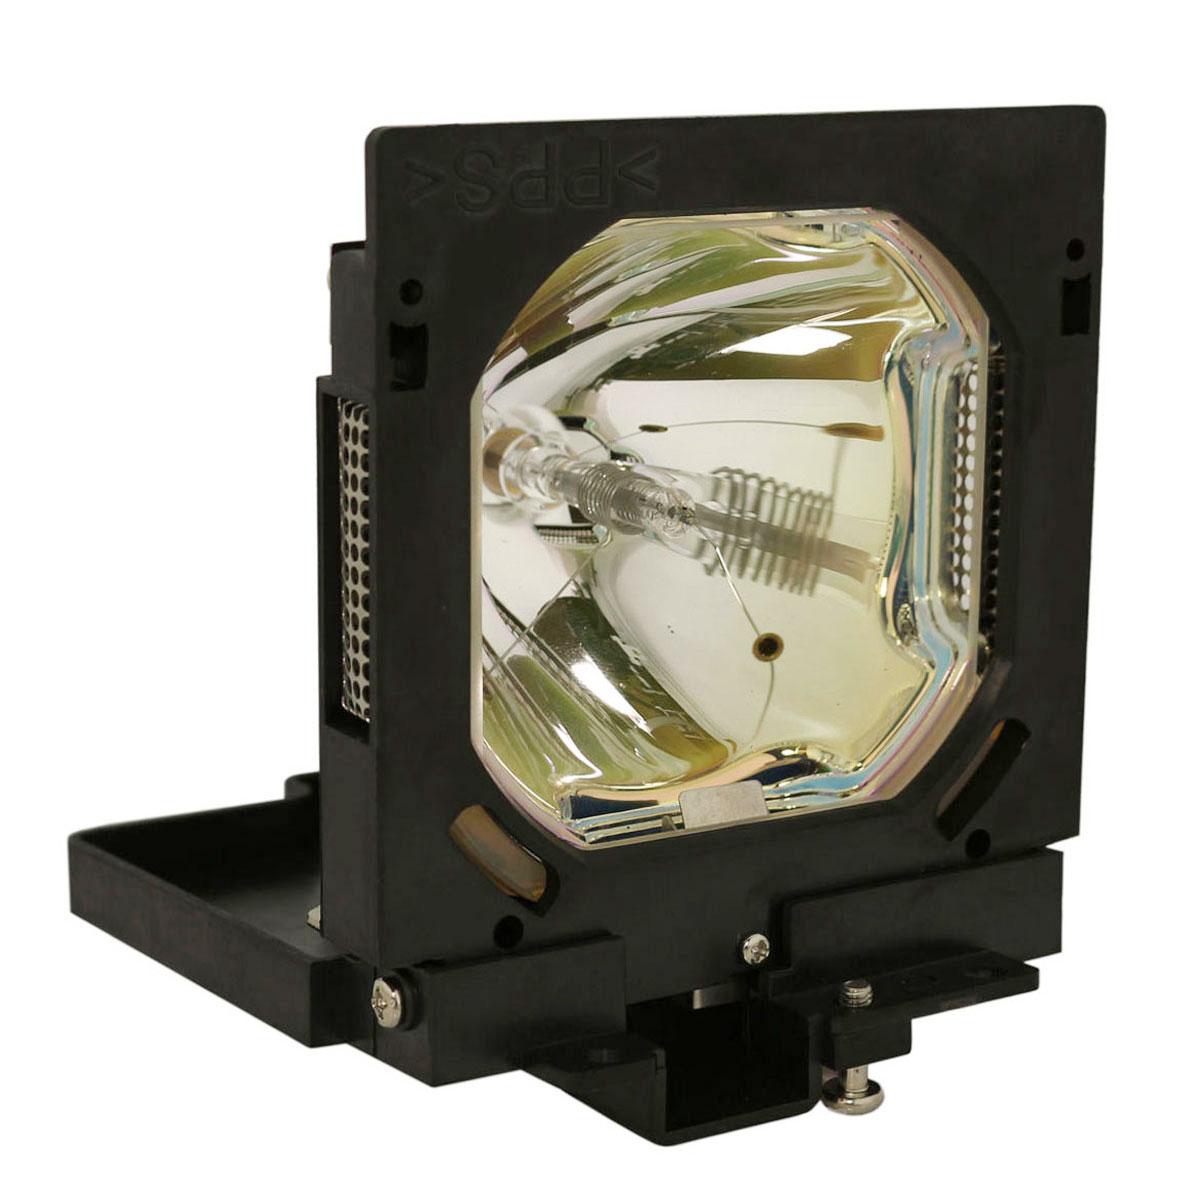 Osram Lamp Housing For Ask Proxima SPLAMP004 Projector DLP LCD Bulb футболка destructo semi auto black